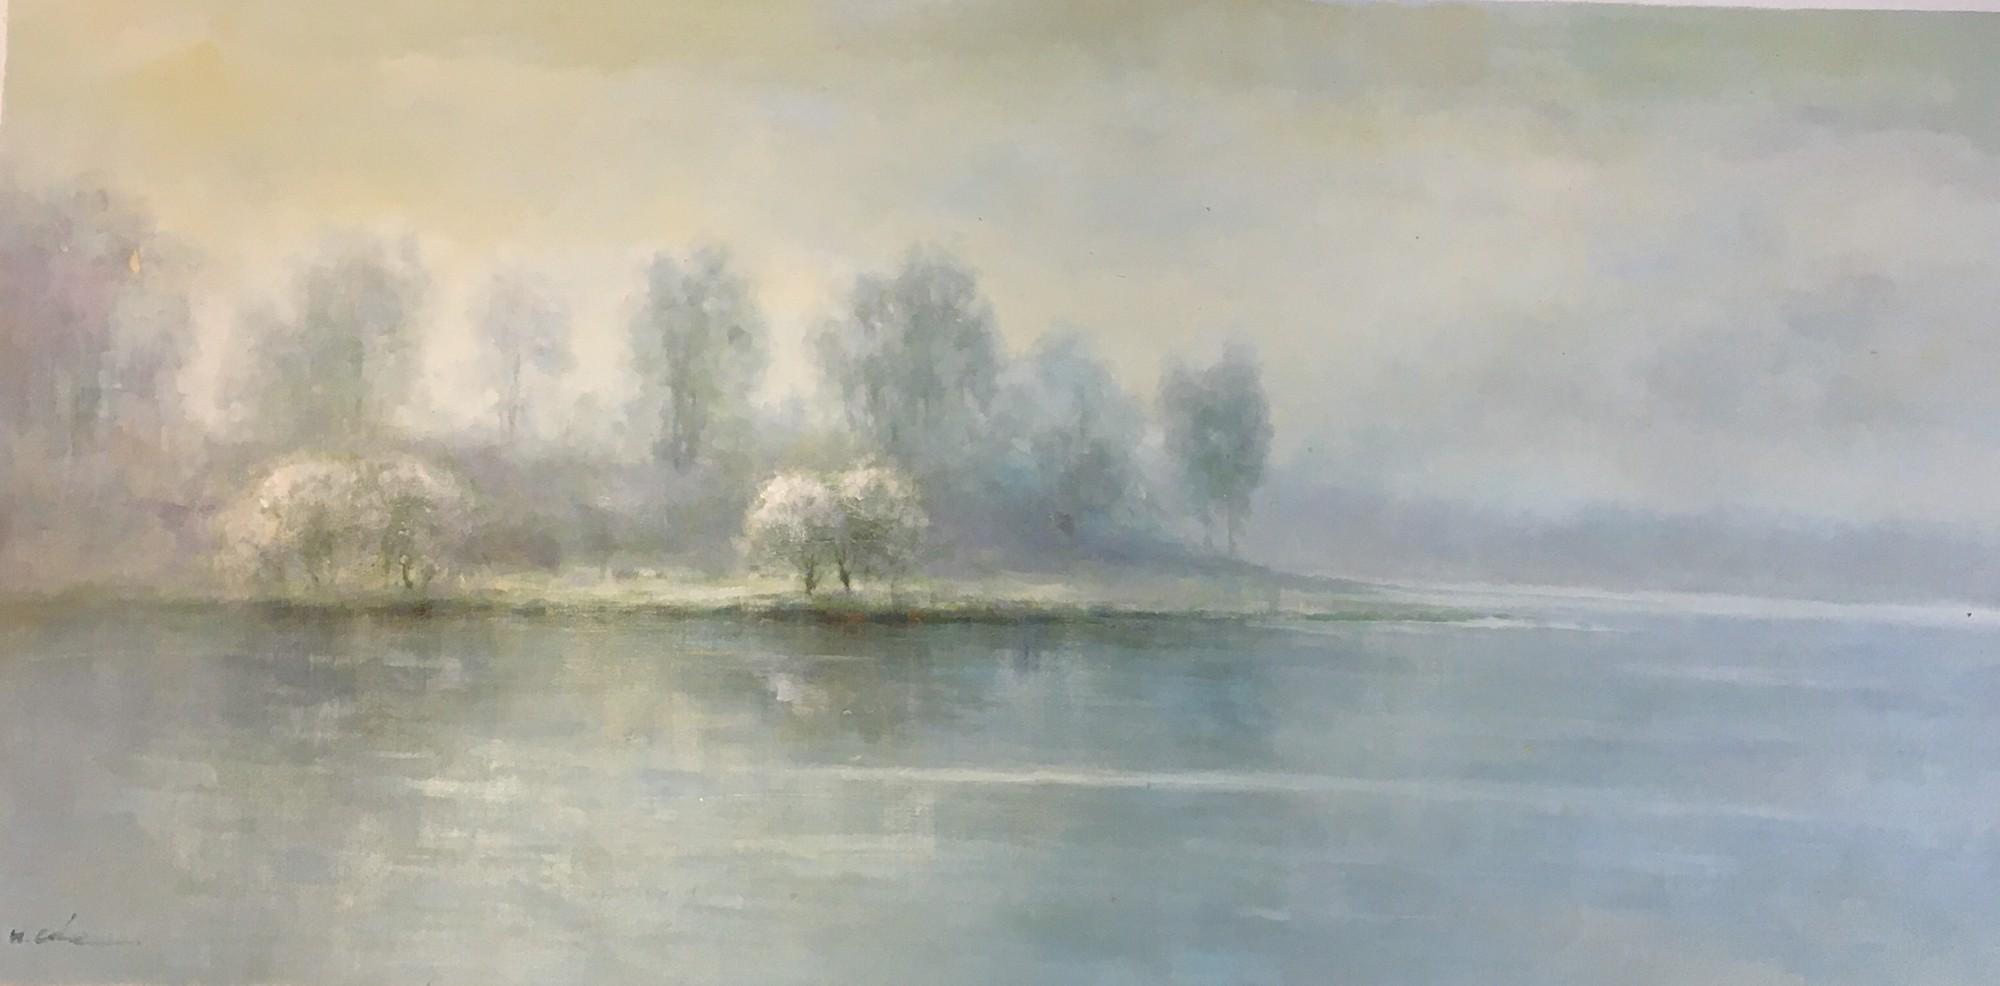 HORIZONTAL LAKE SCENE by H COLE